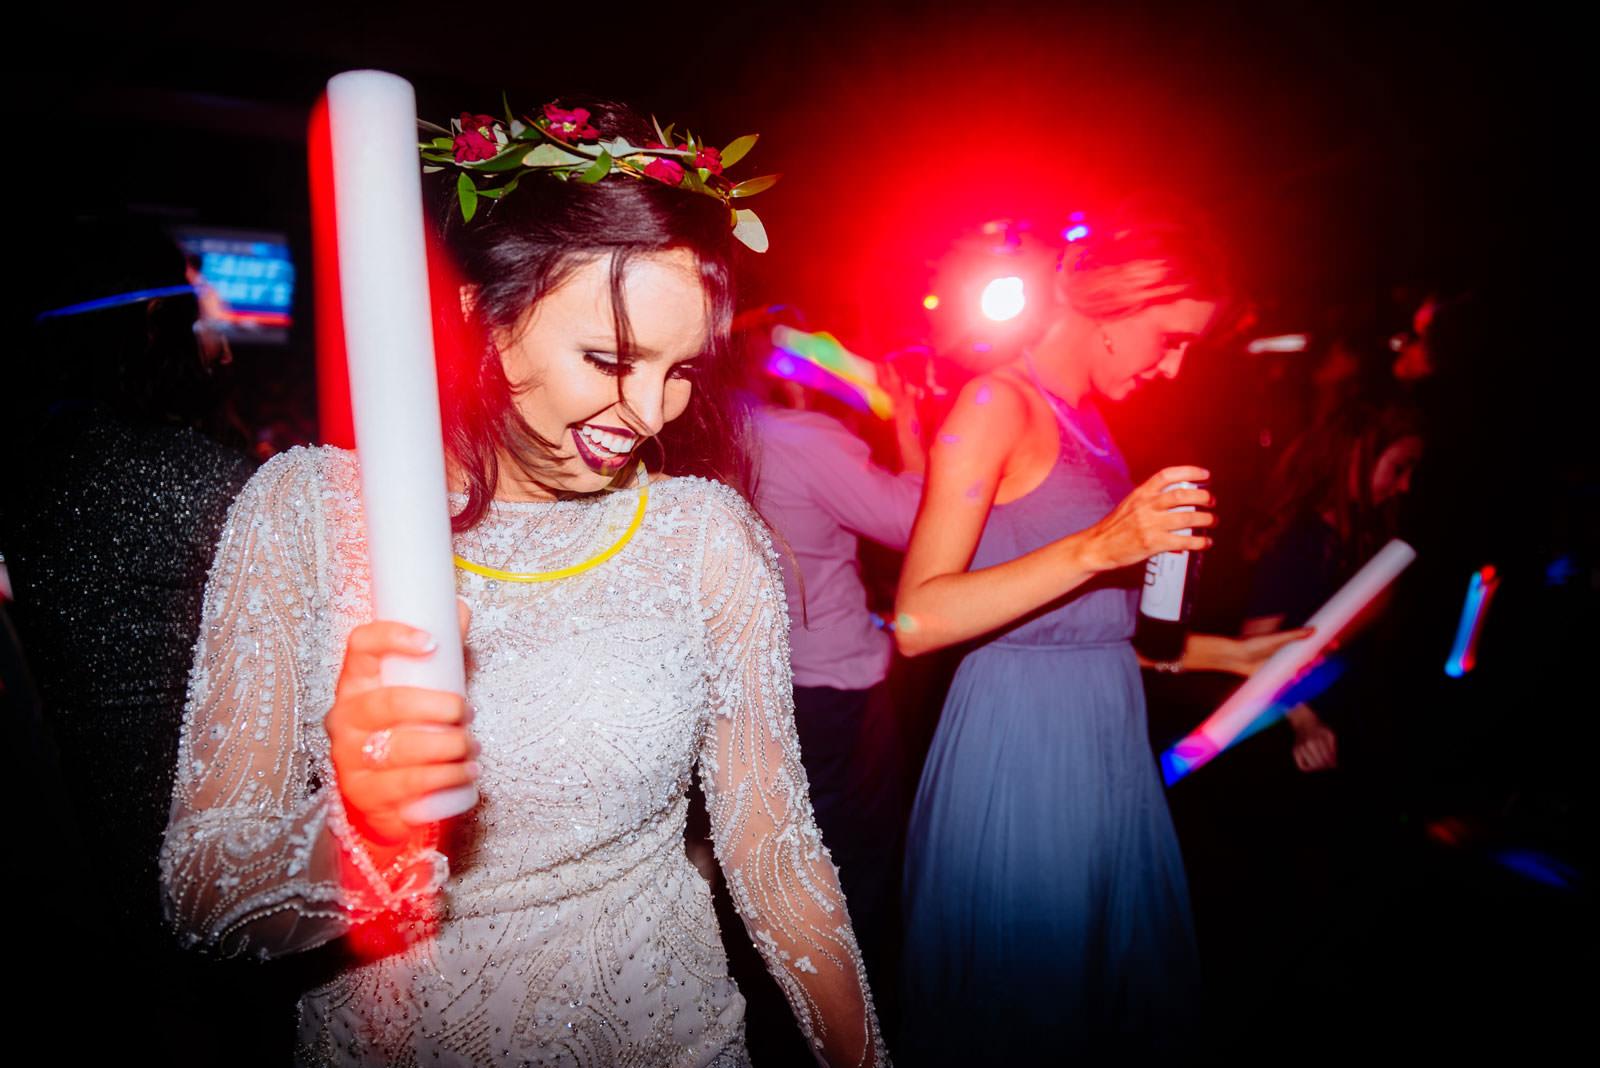 051bride waving glowstick during reception dancing